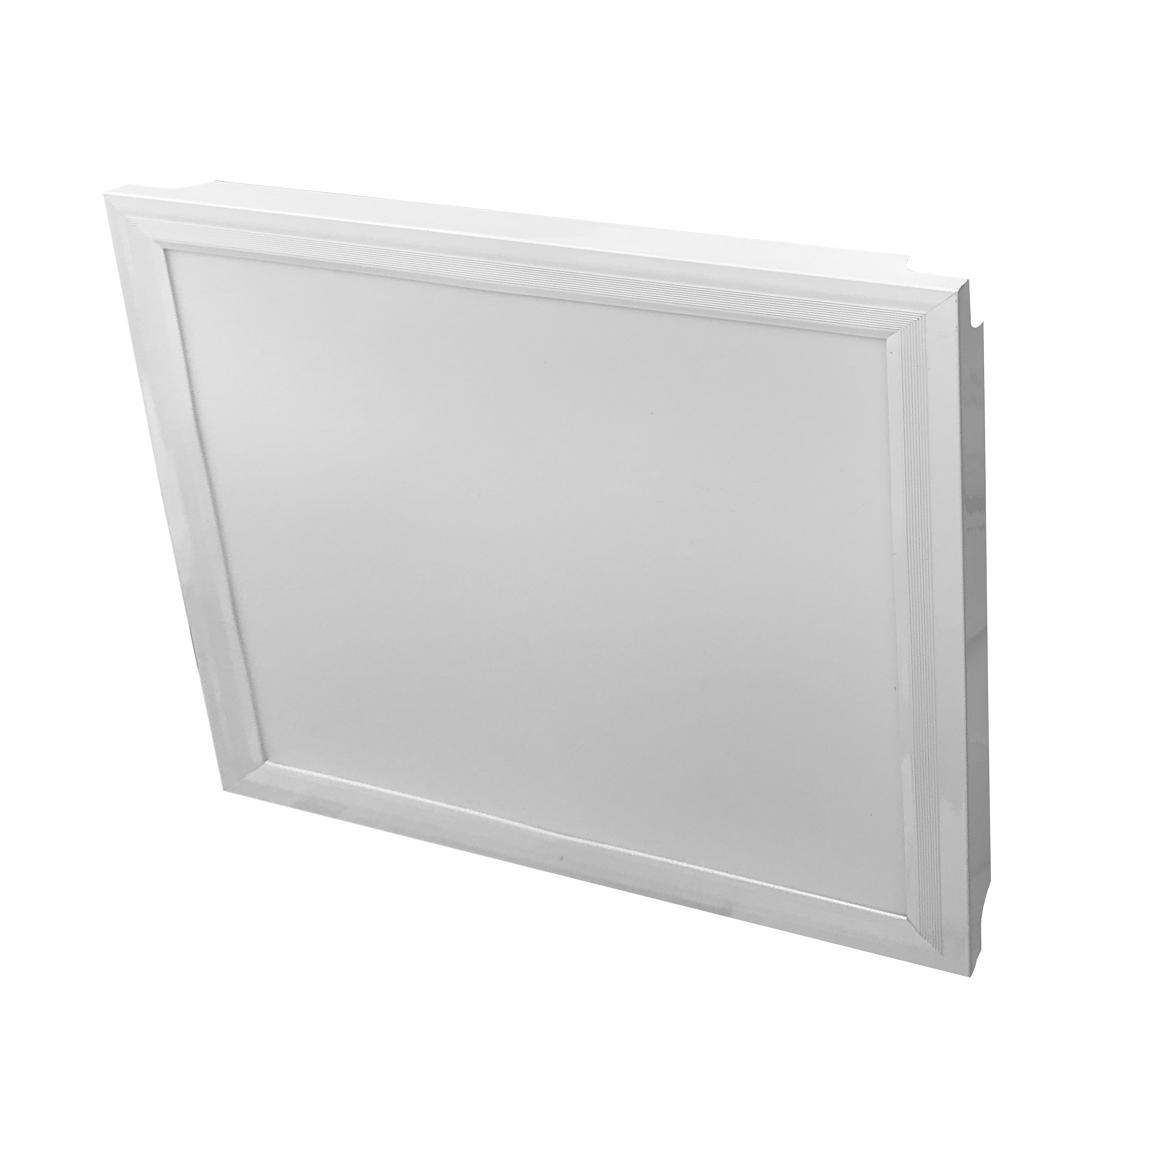 FORLIFE FL-2051 - 20 Watt Sıva Altı 30x30 LED Panel Armatür